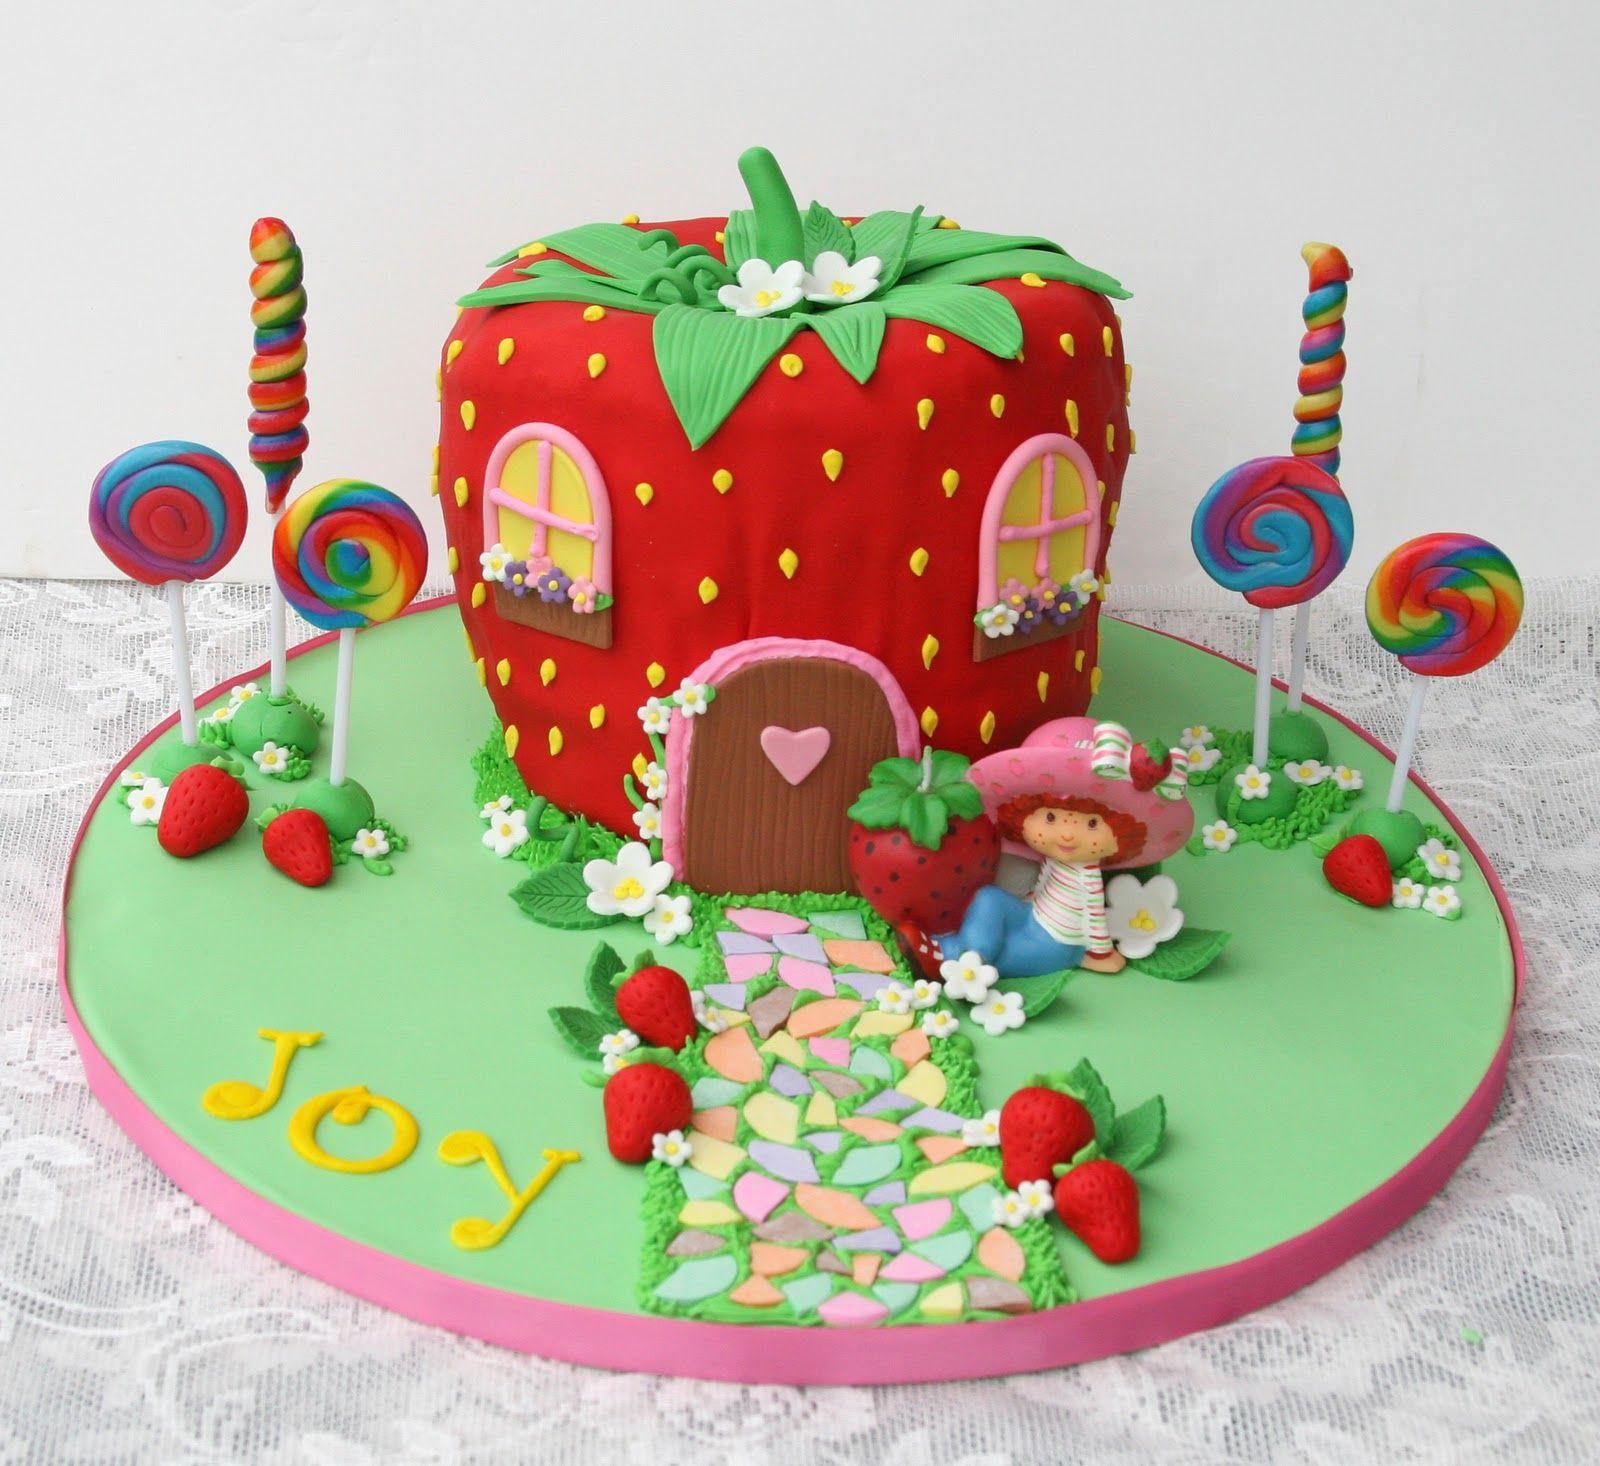 My Life in Birthday Cakes